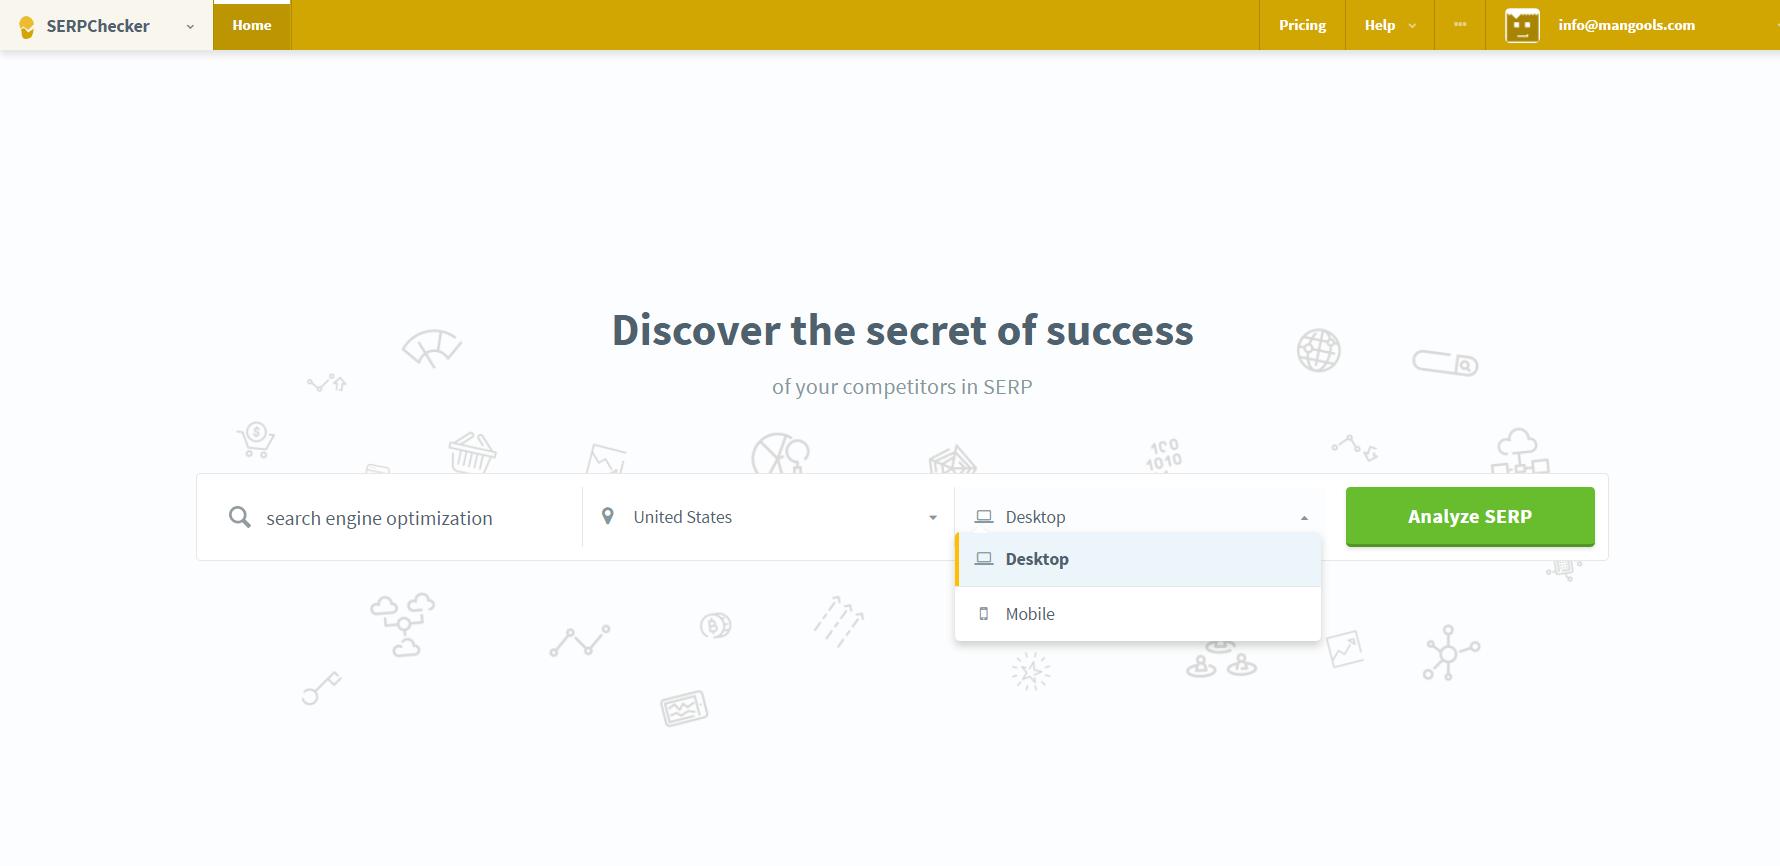 serpchecker seo analysis guide